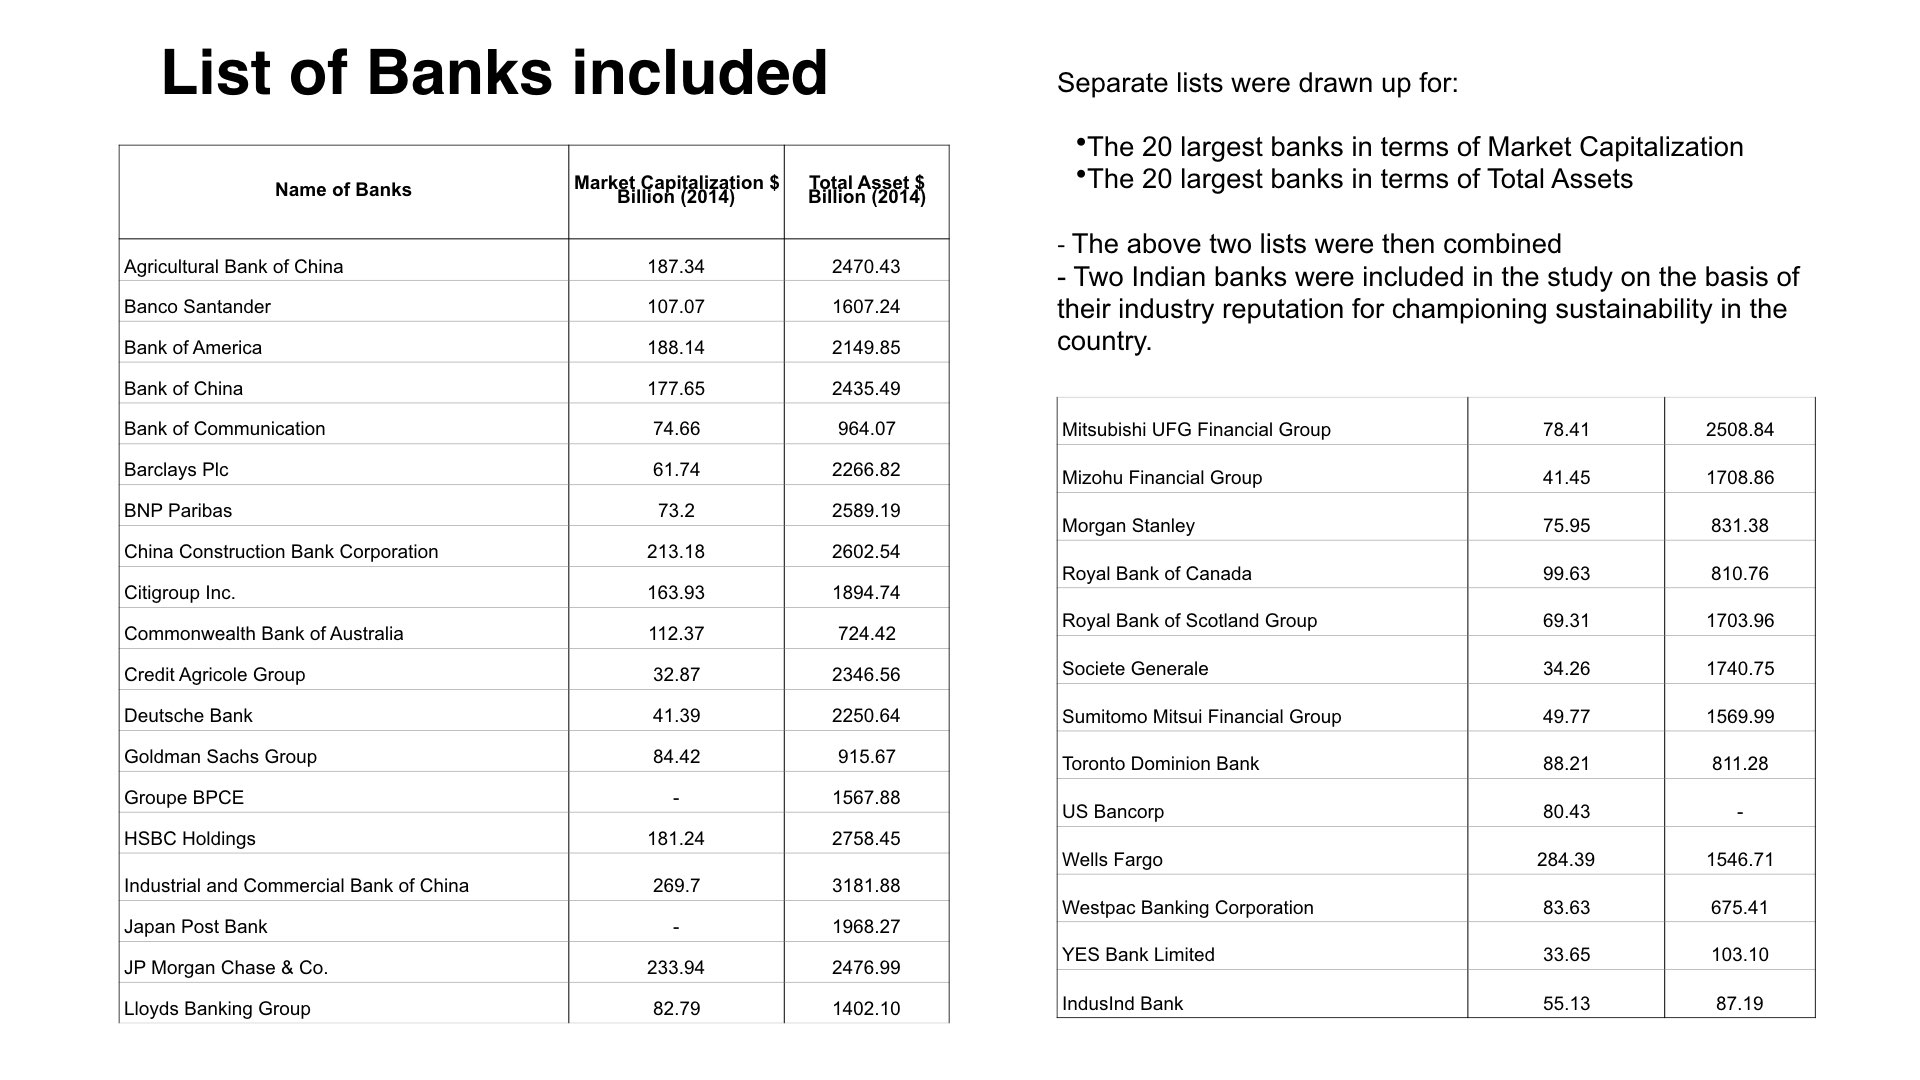 Maturitymodelblog-Banking-1(of)8.003.jpeg